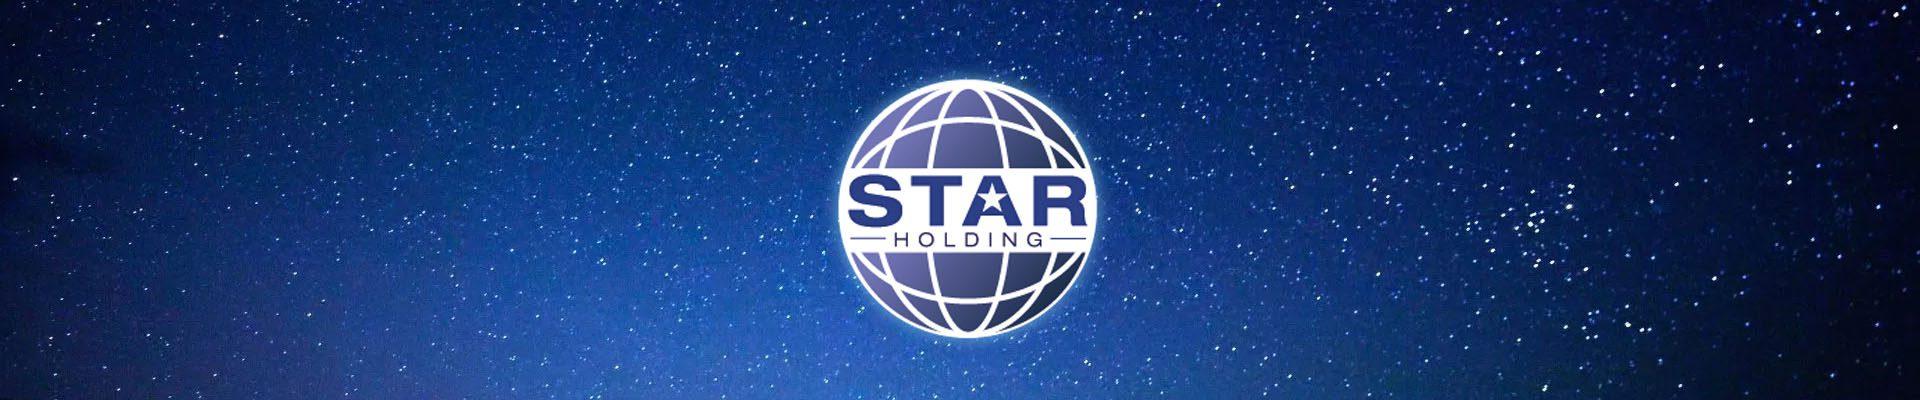 StarCatalunya.com